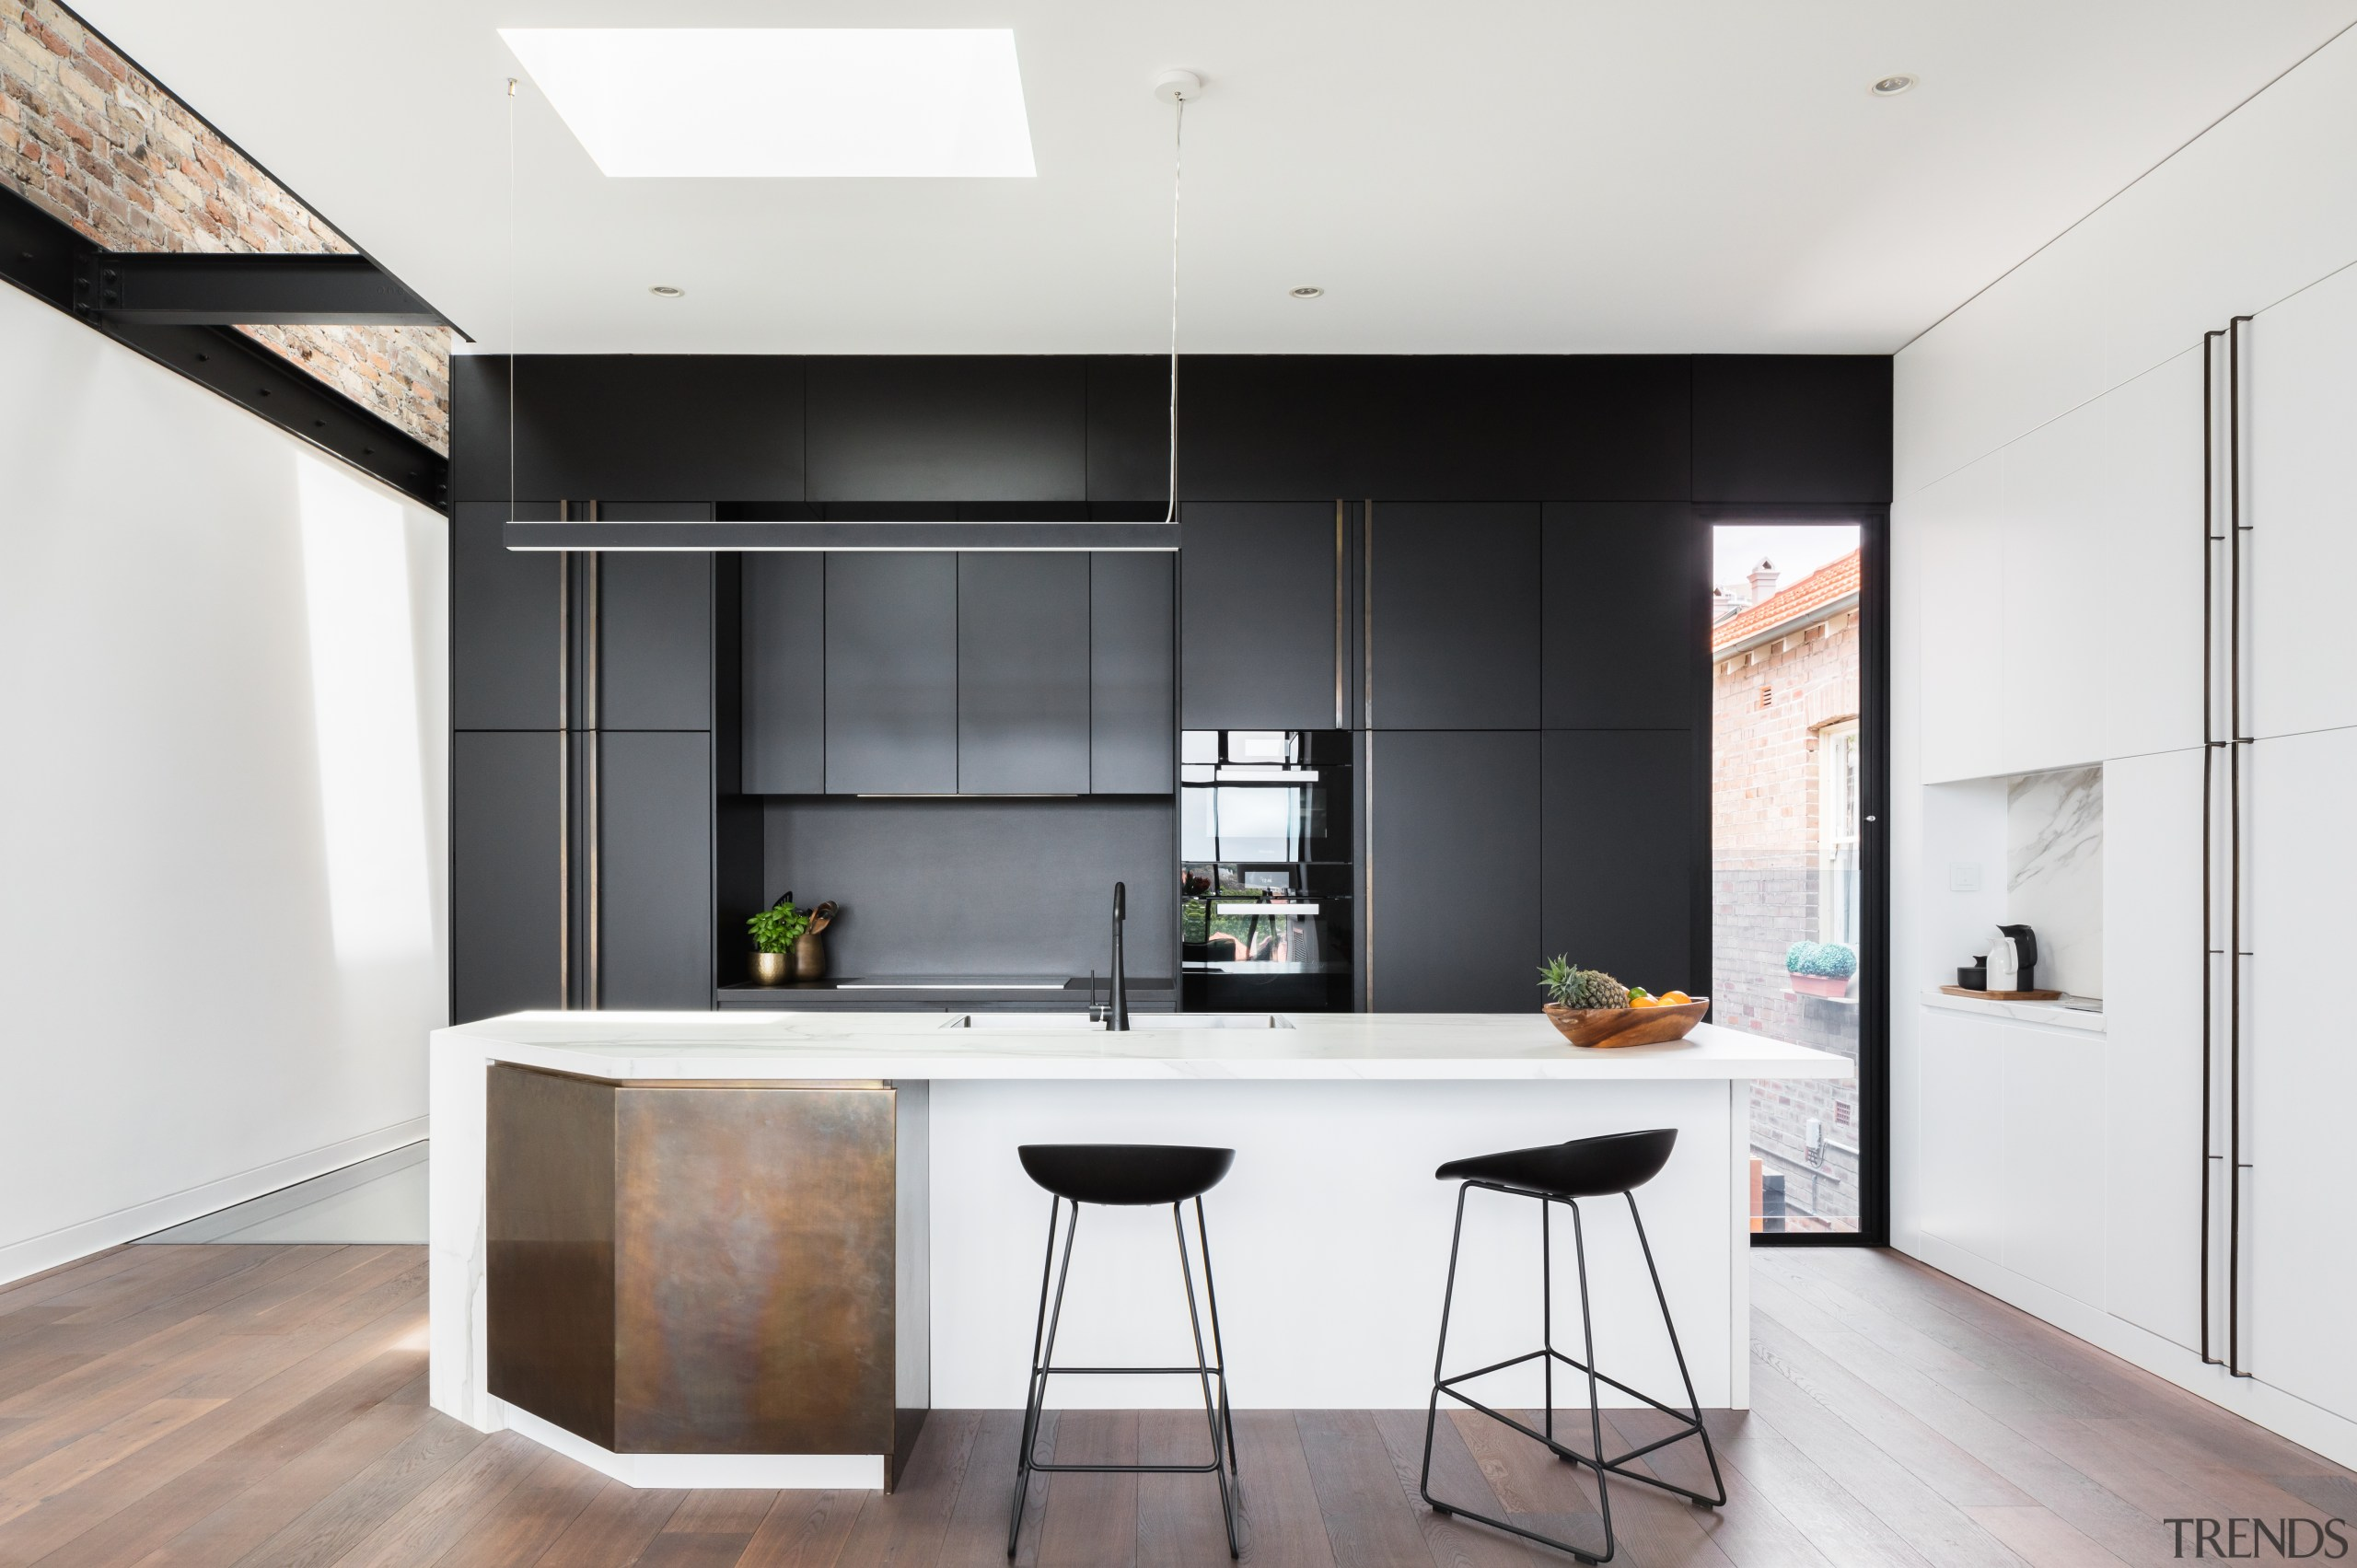 Nz3406Bijl–286981396 02 - architecture | countertop | house architecture, countertop, house, interior design, kitchen, white